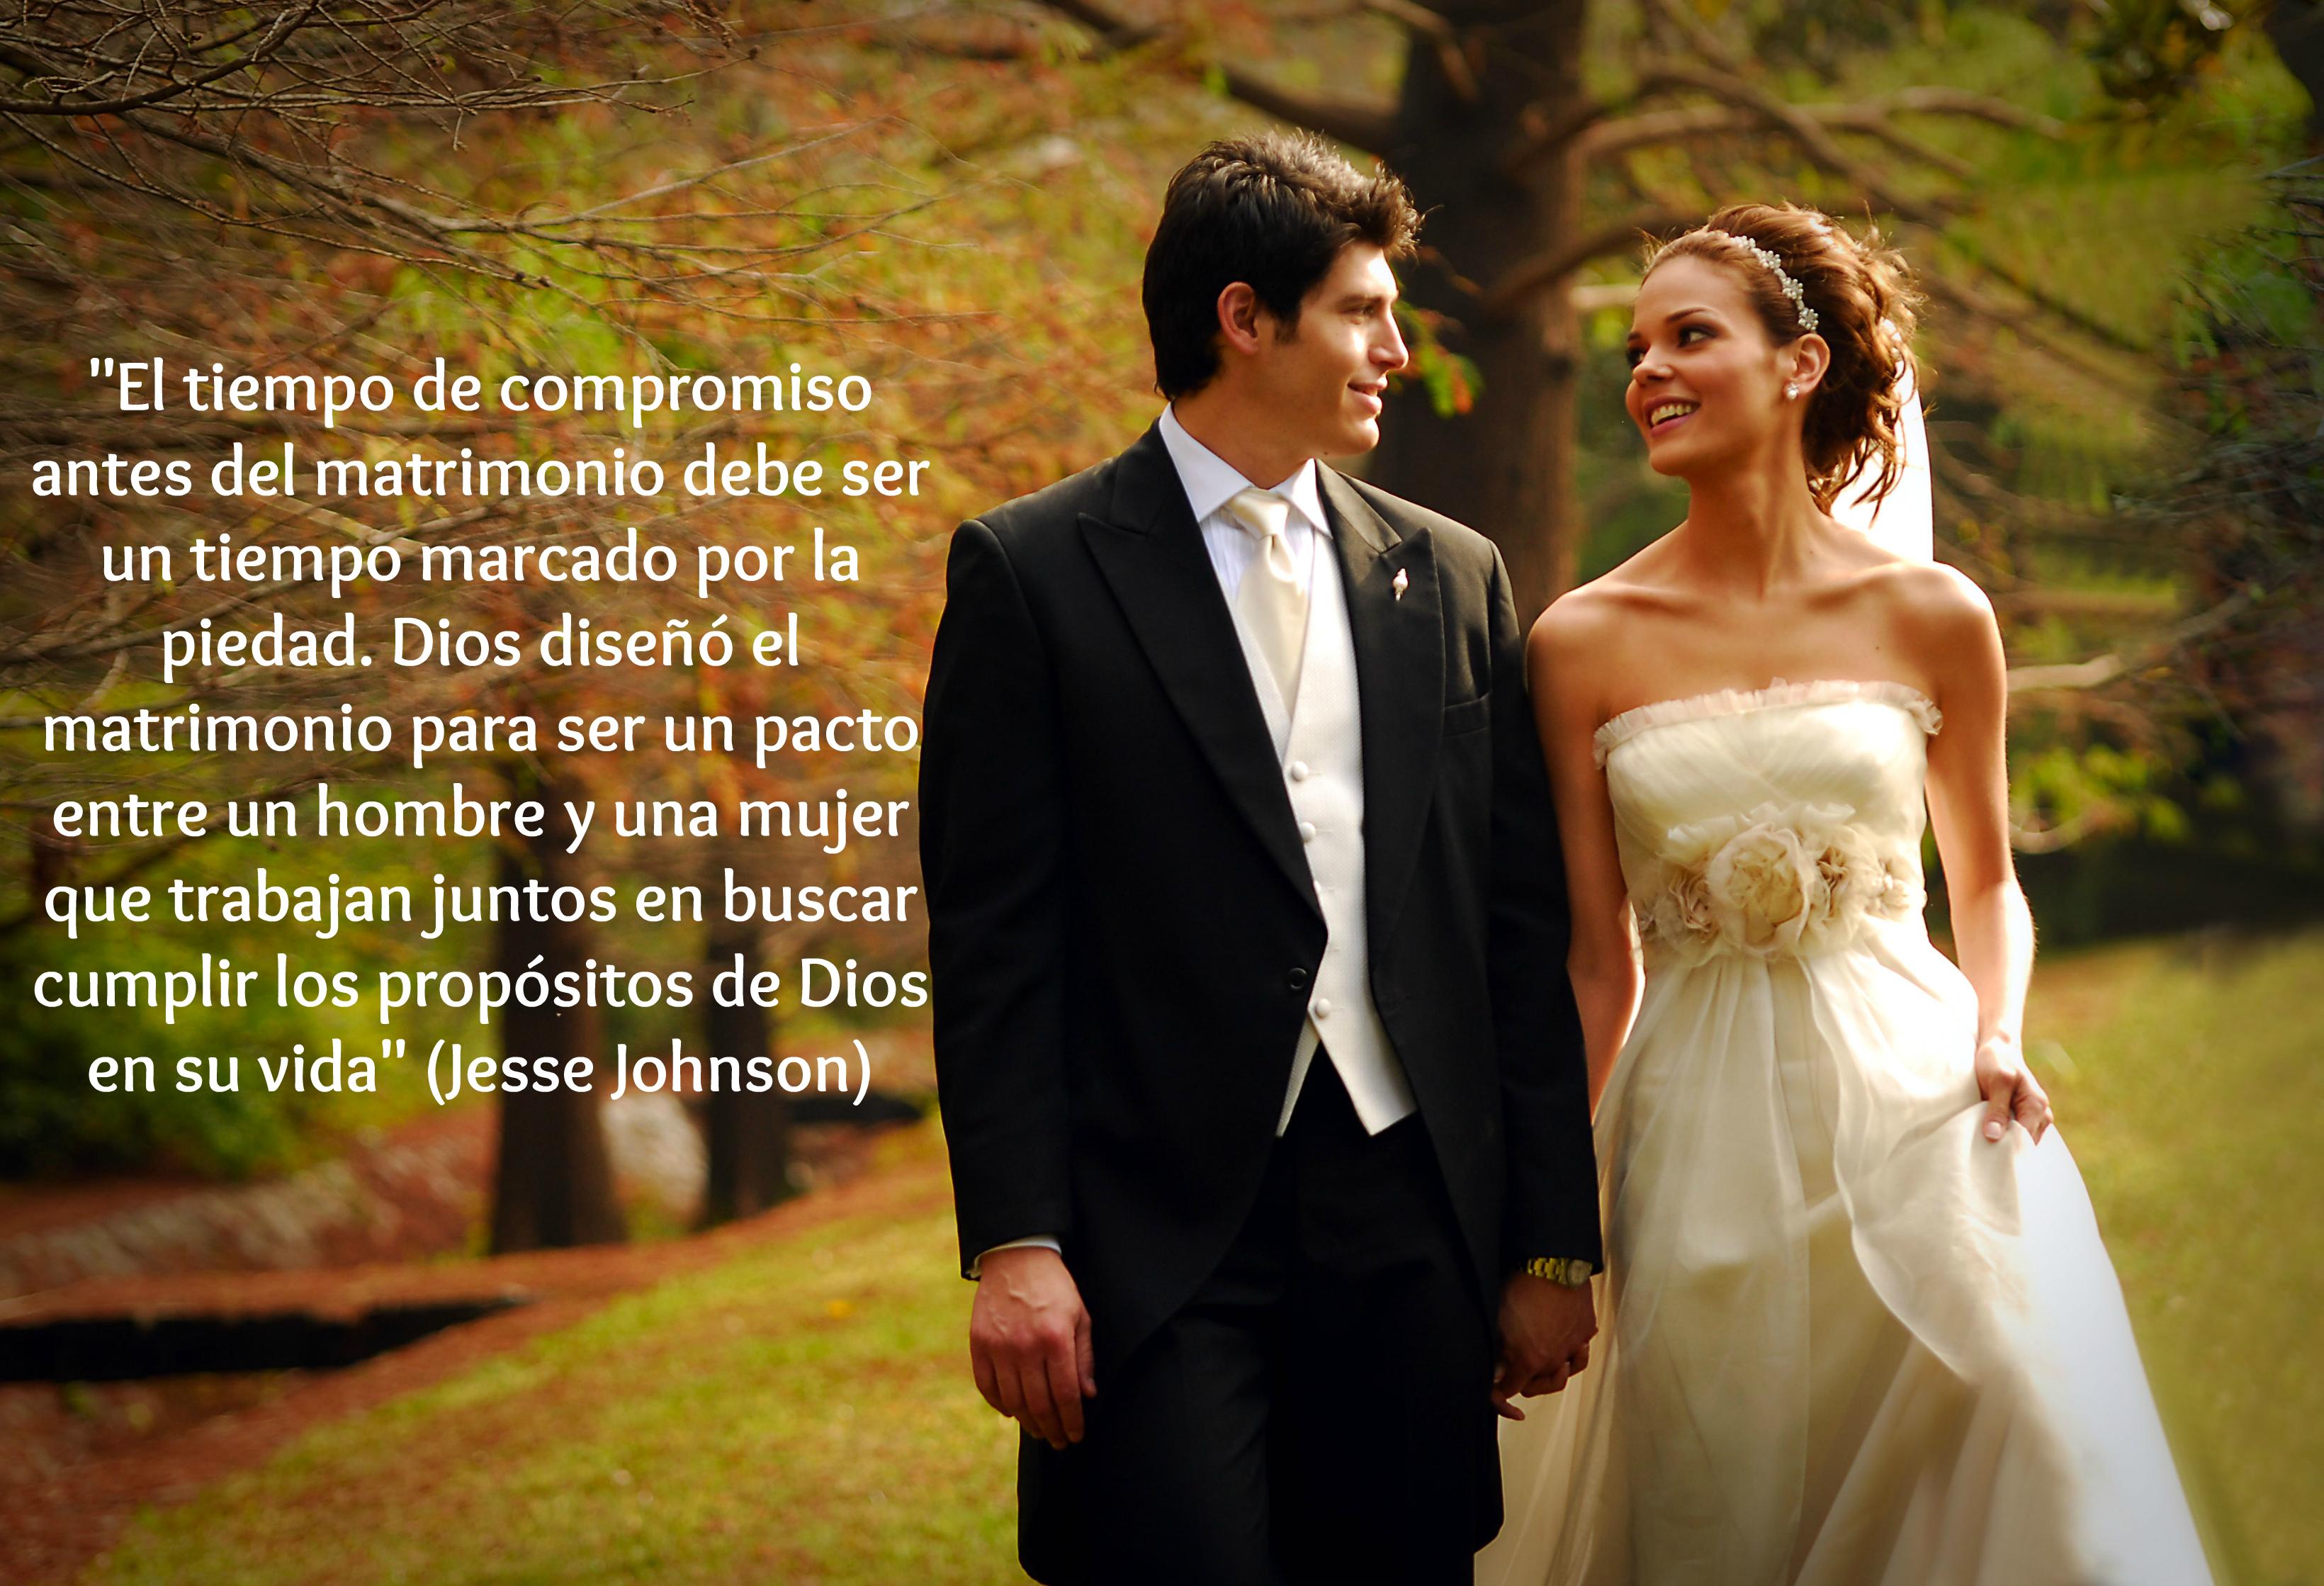 Matrimonio Primos Biblia : Consejos para parejas de novios comprometidos